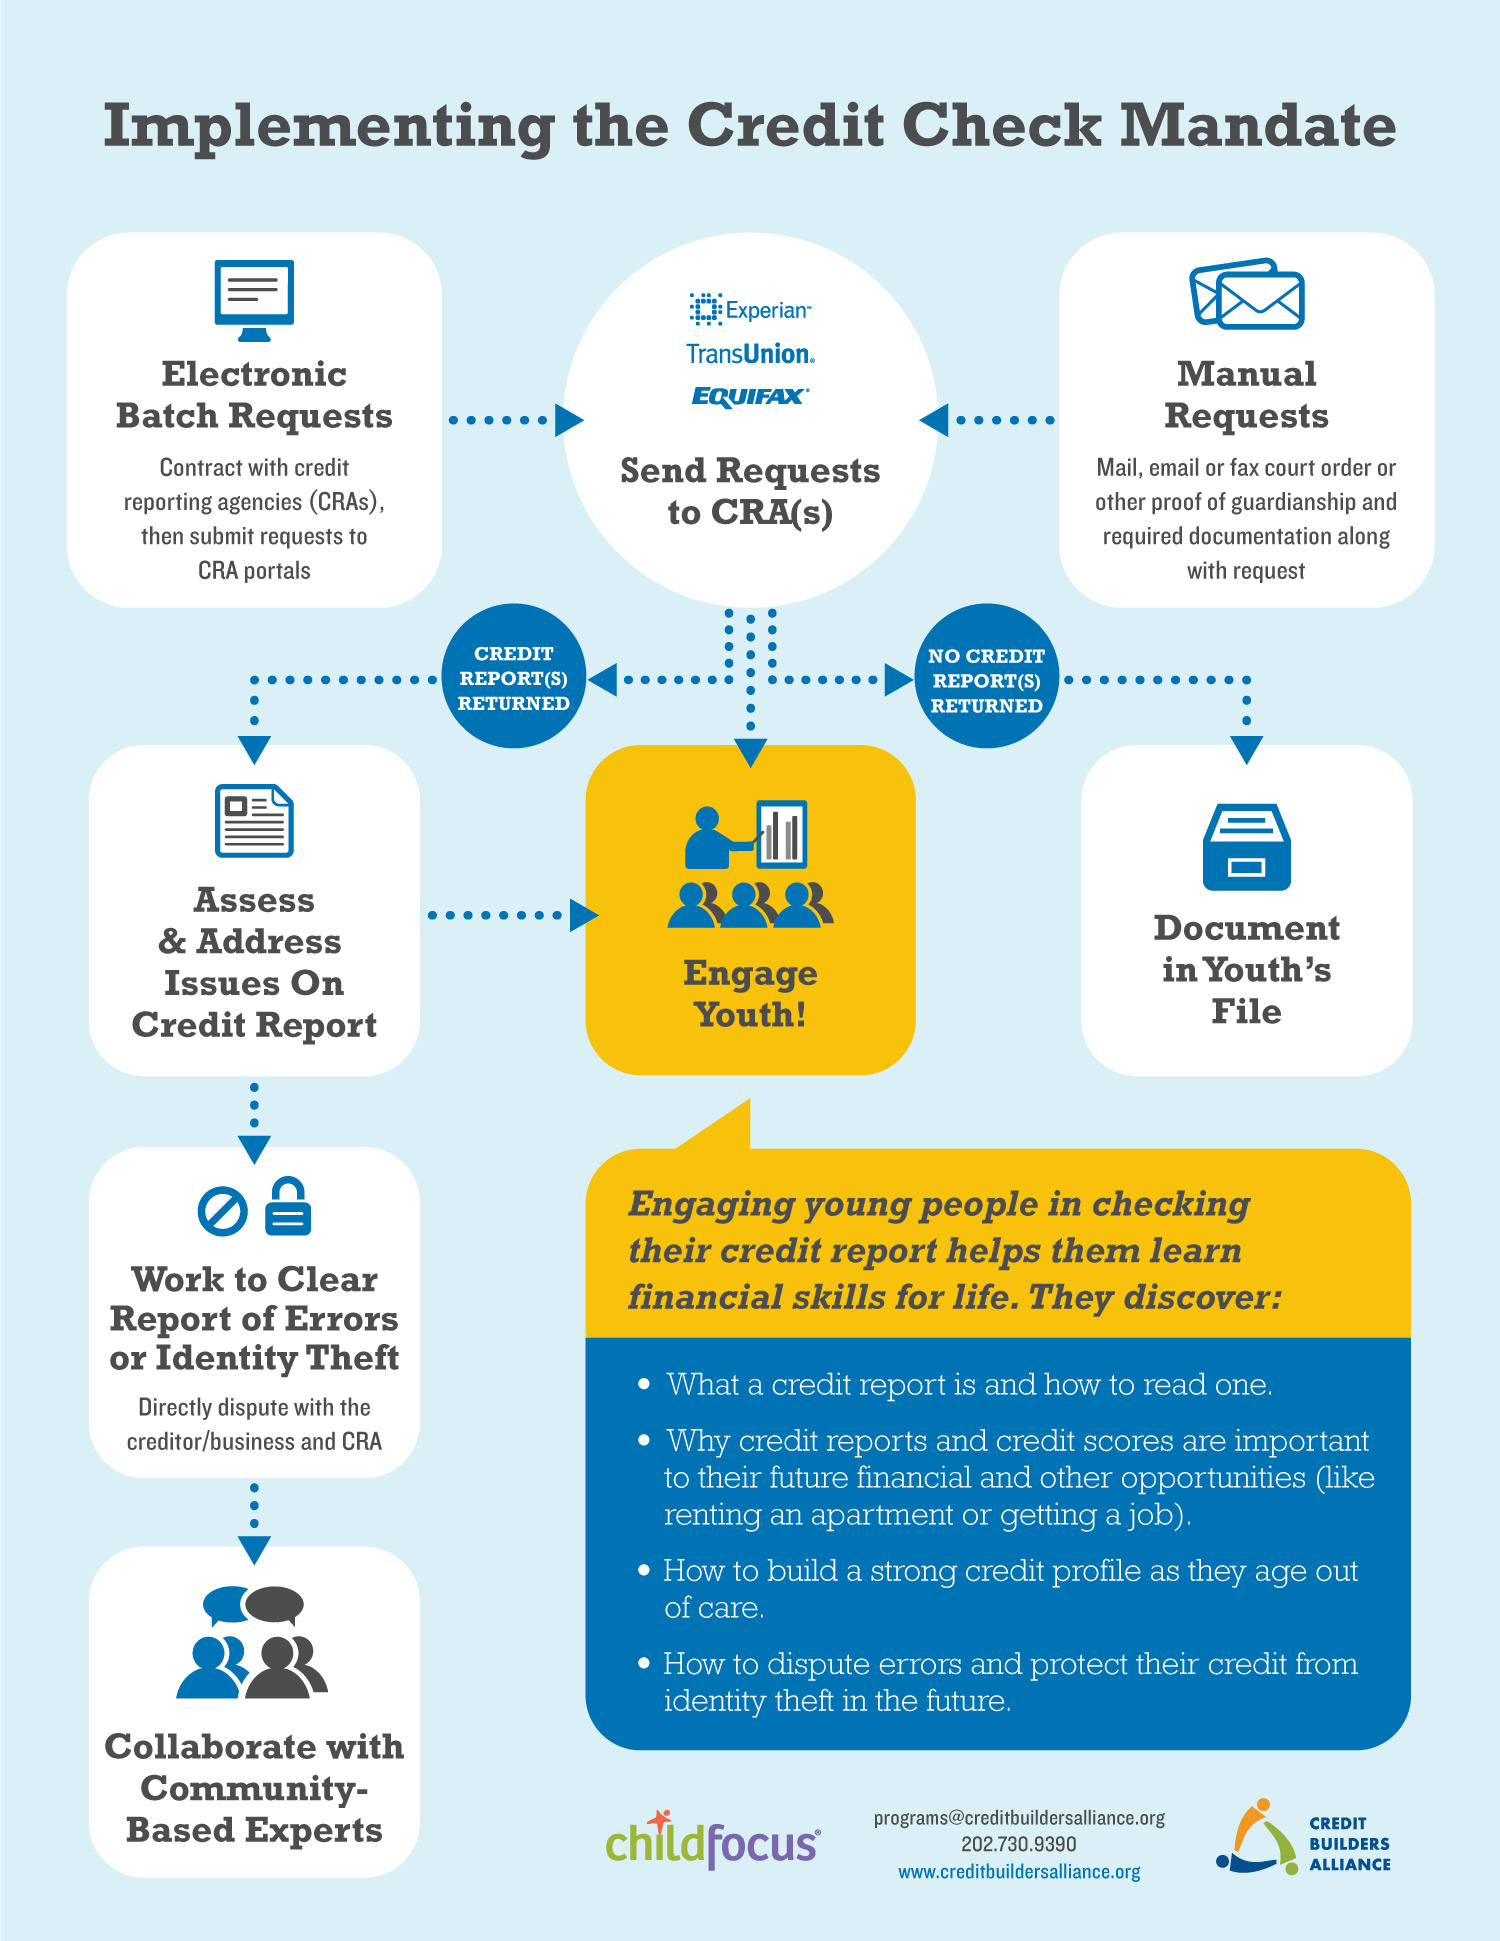 YouthCreditCheckToolkit-Infographic.jpg